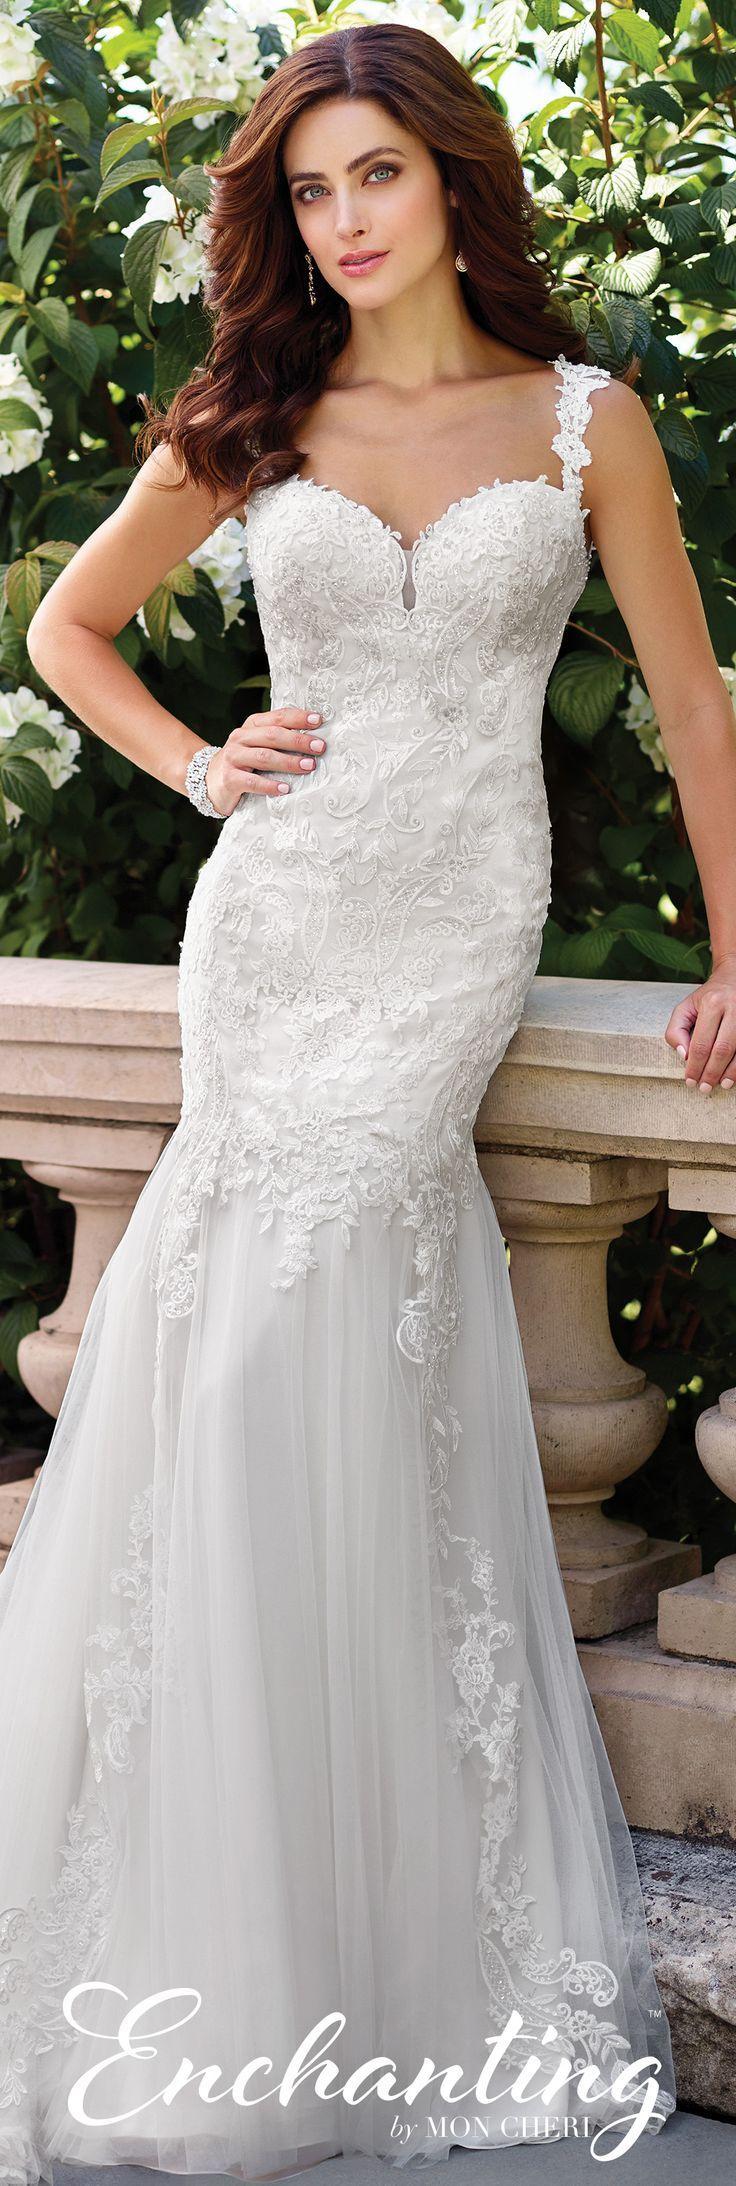 Свадьба - Chiffon Fit And Flare Wedding Dress- 117194- Enchanting By Mon Cheri